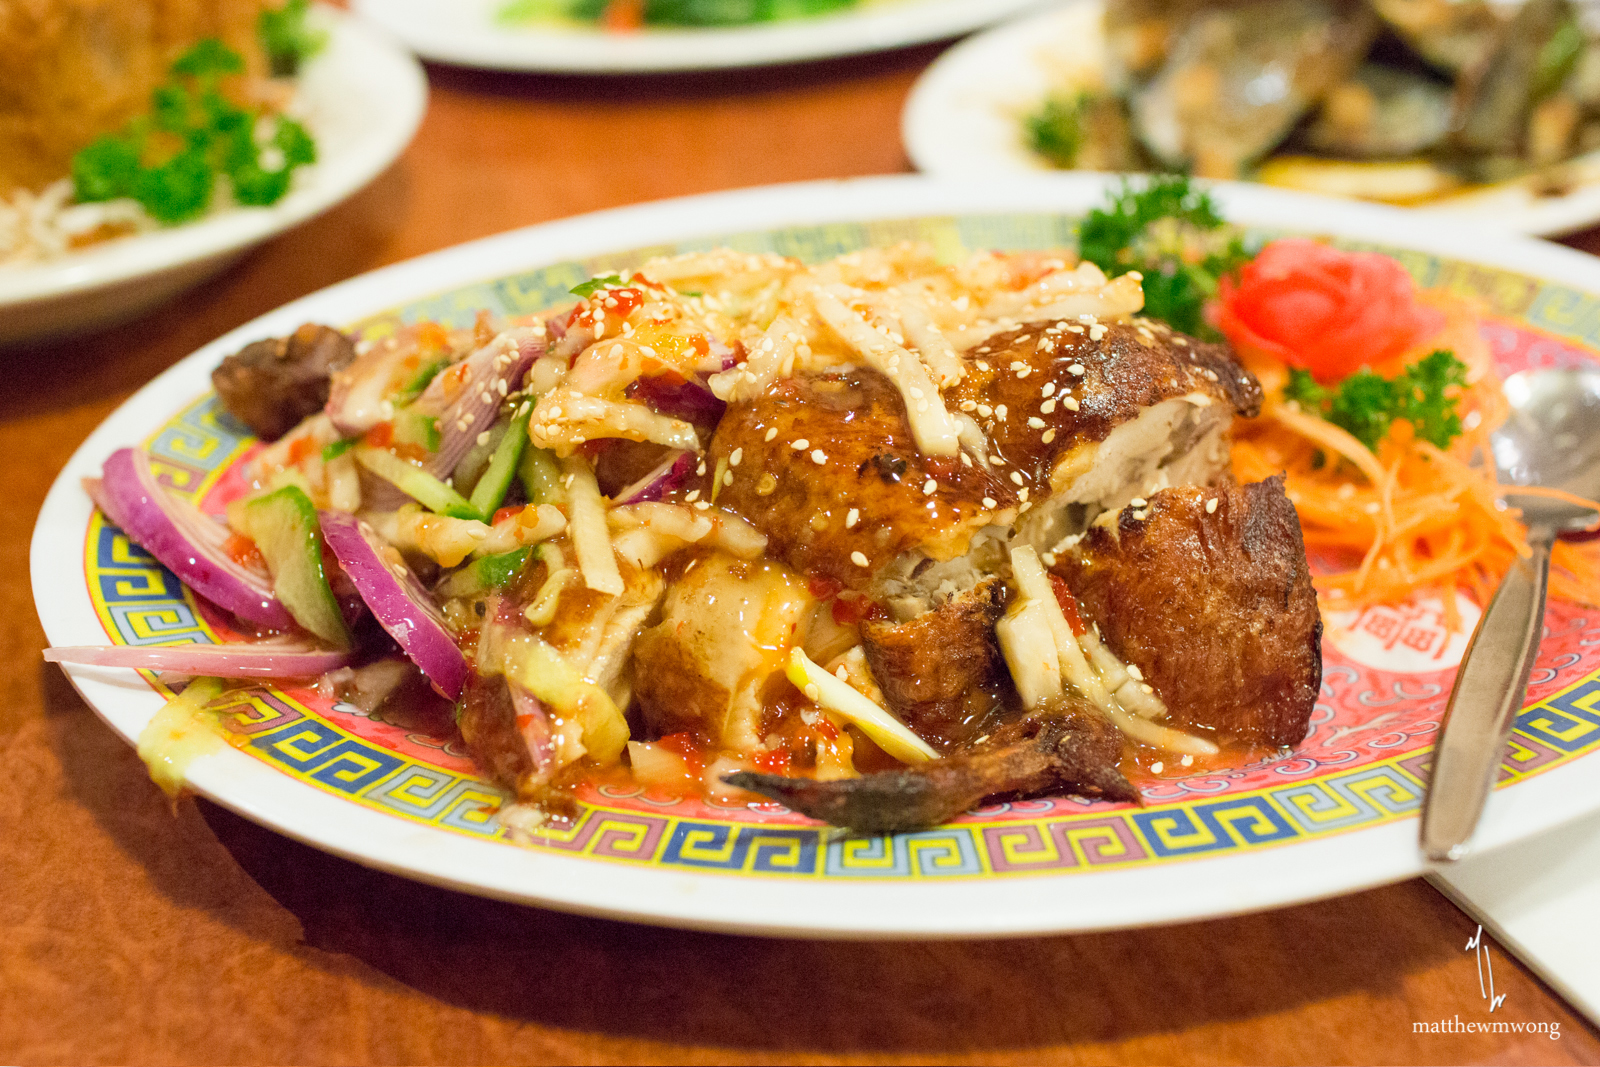 Thai Crispy Chicken, half serve of roast chicken topped with sweet chilli sauce